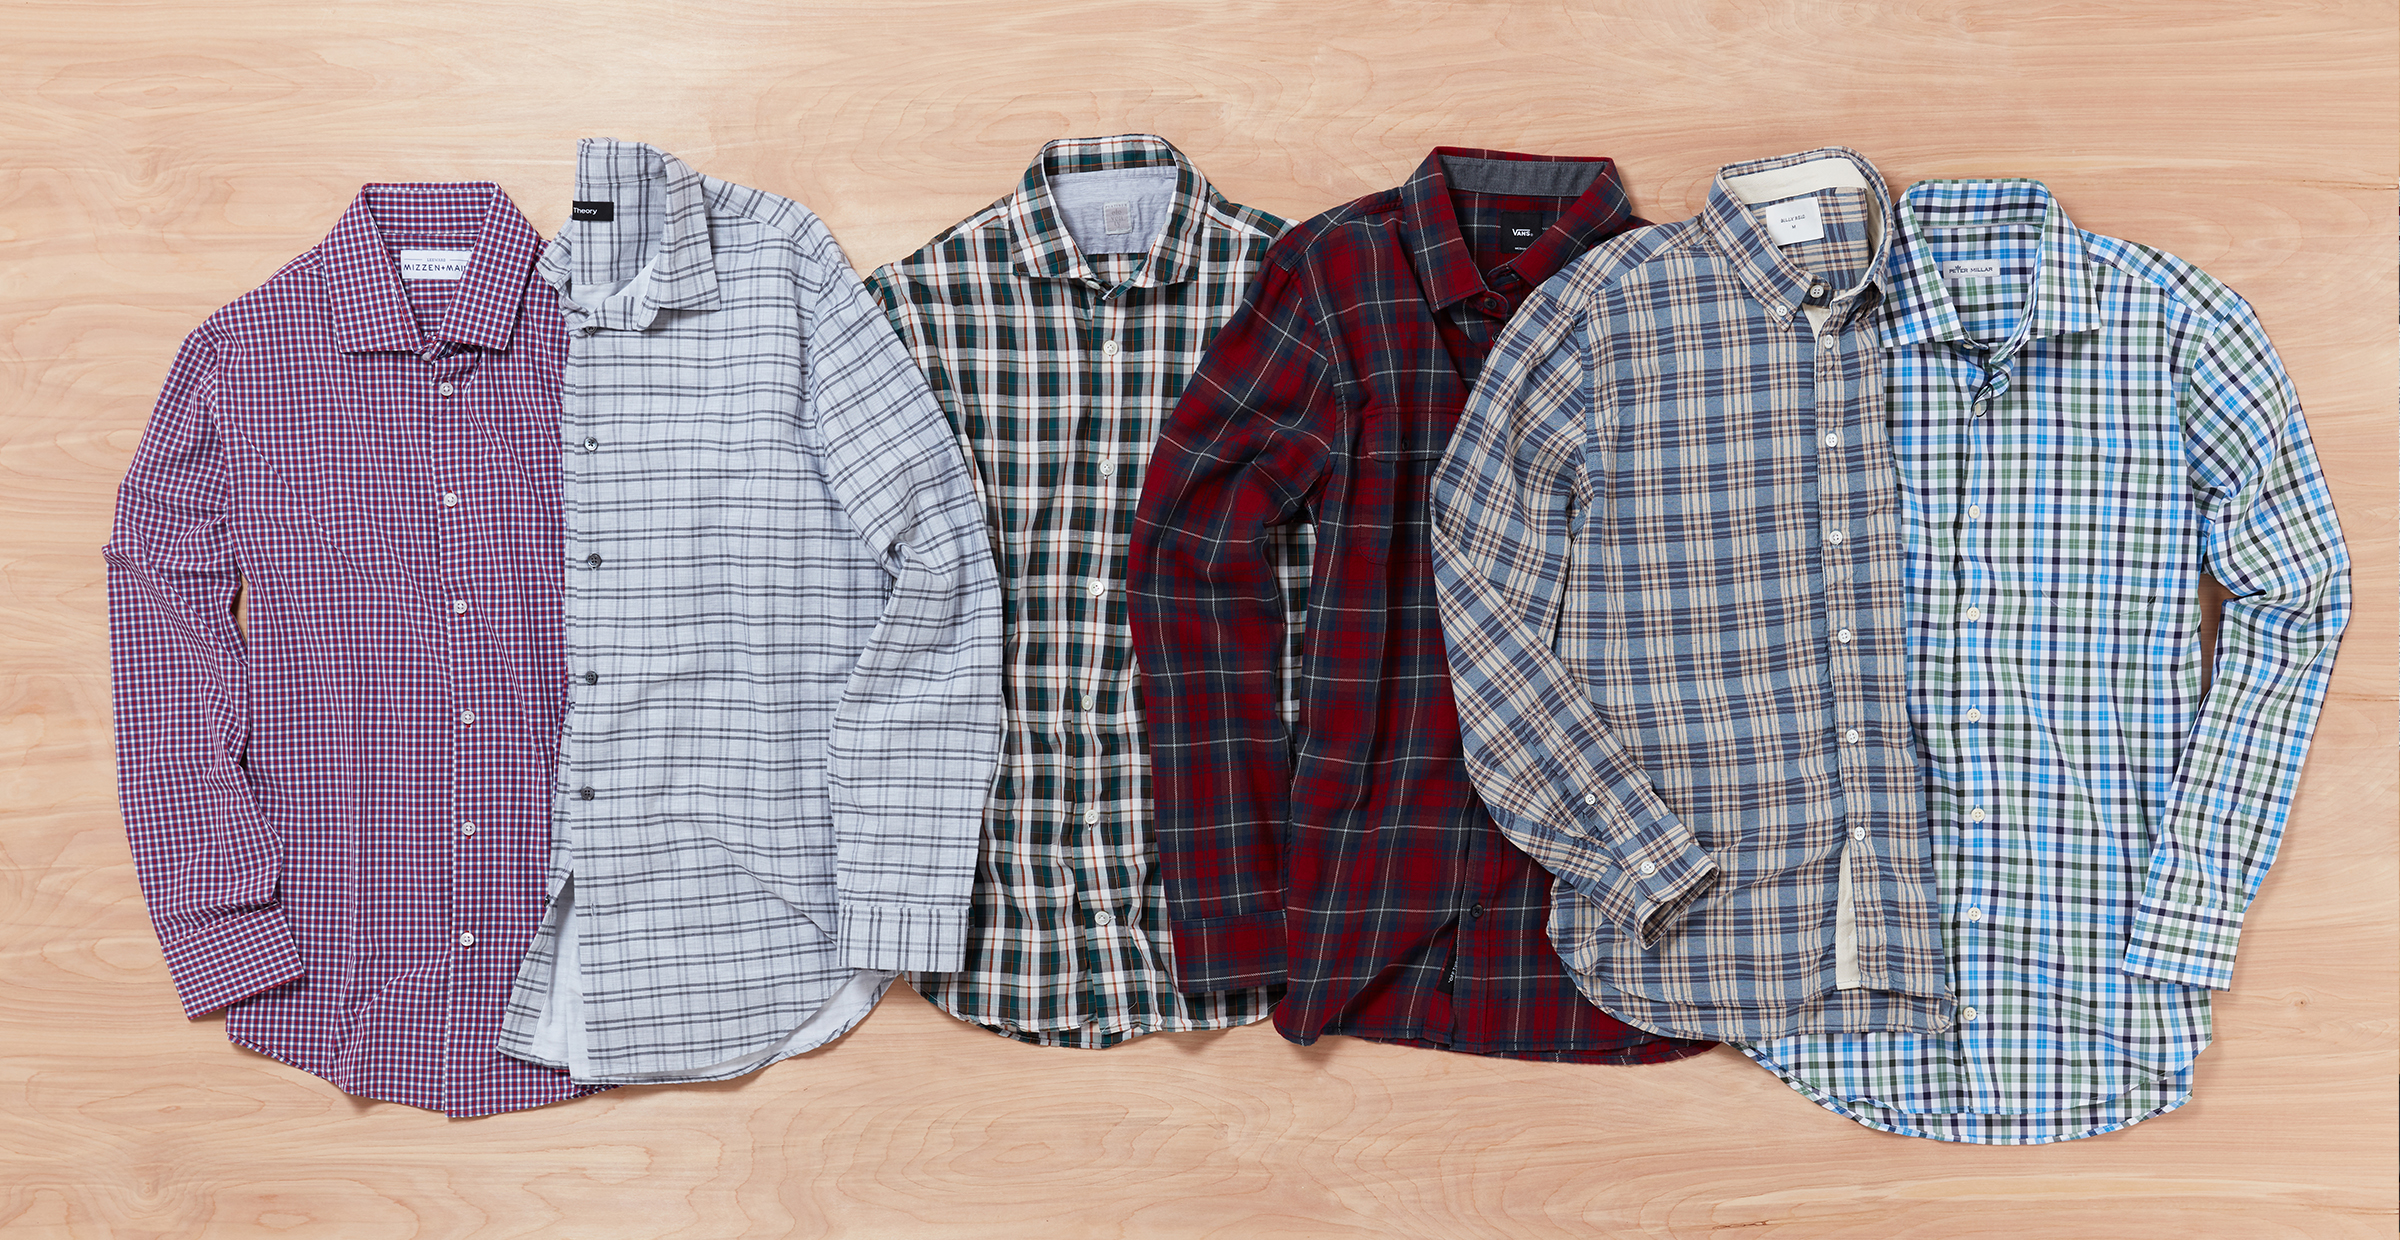 Variety of men's plaid shirts